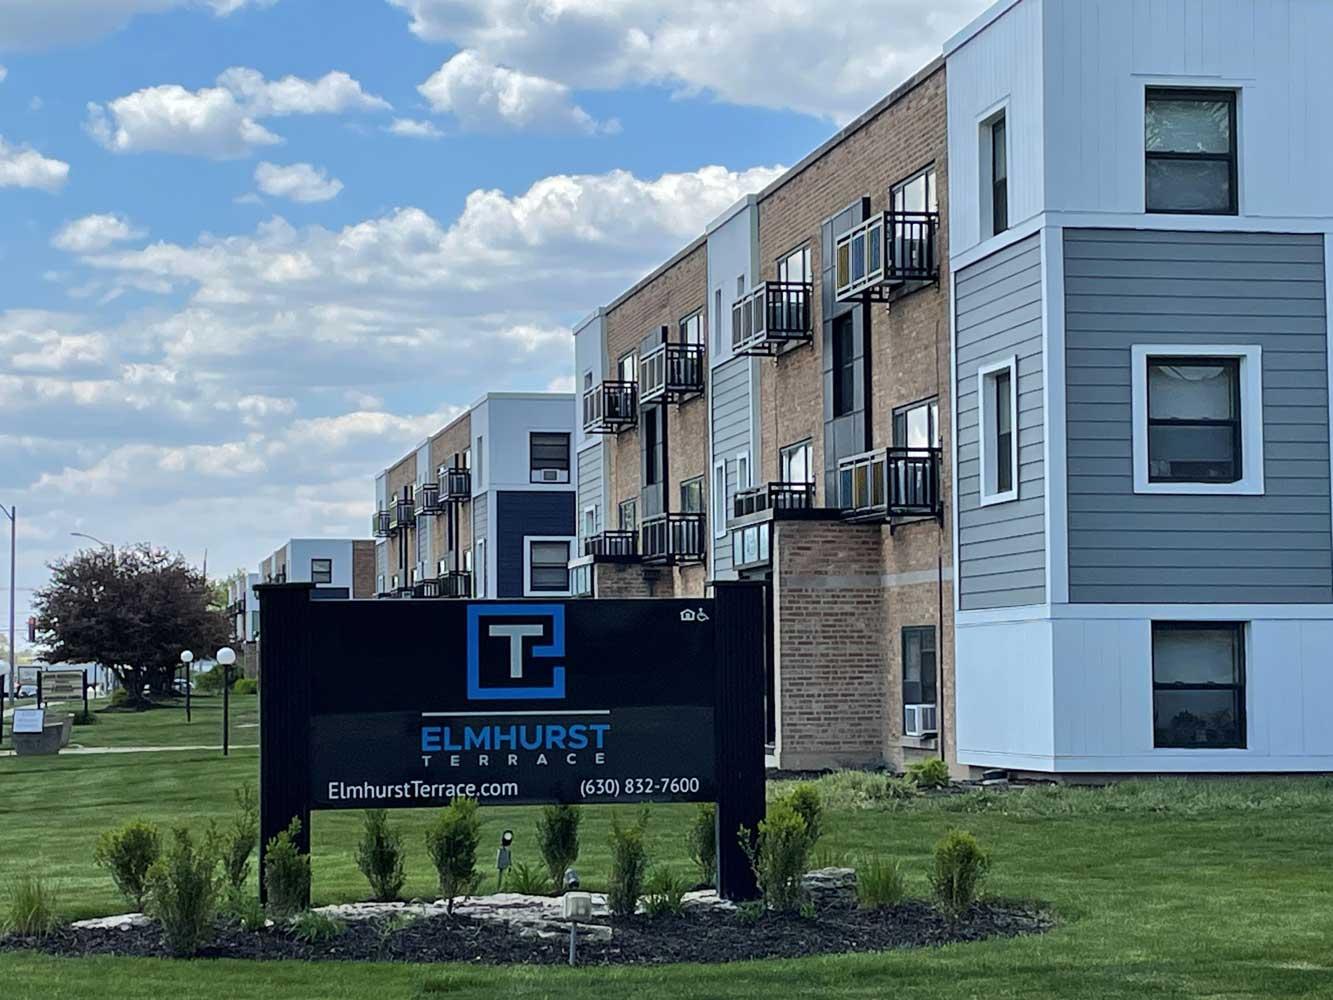 Welcome Sign at Elmhurst Terrace Apartments in Elmhurst, Illinois